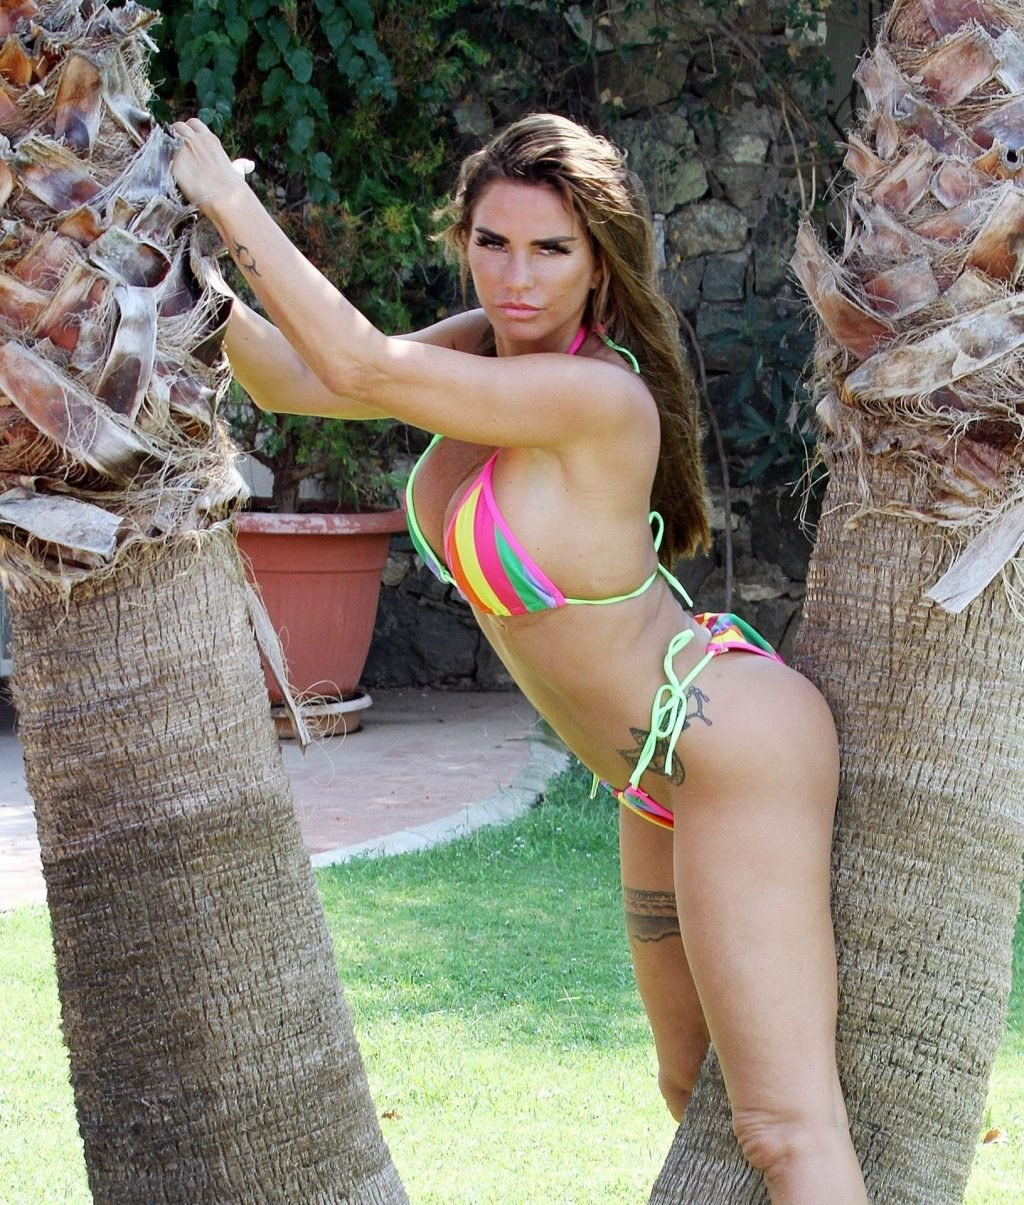 Katie-Price-Nude-Sexy-TheFappeningBlog.com-80-1024x1205.jpg